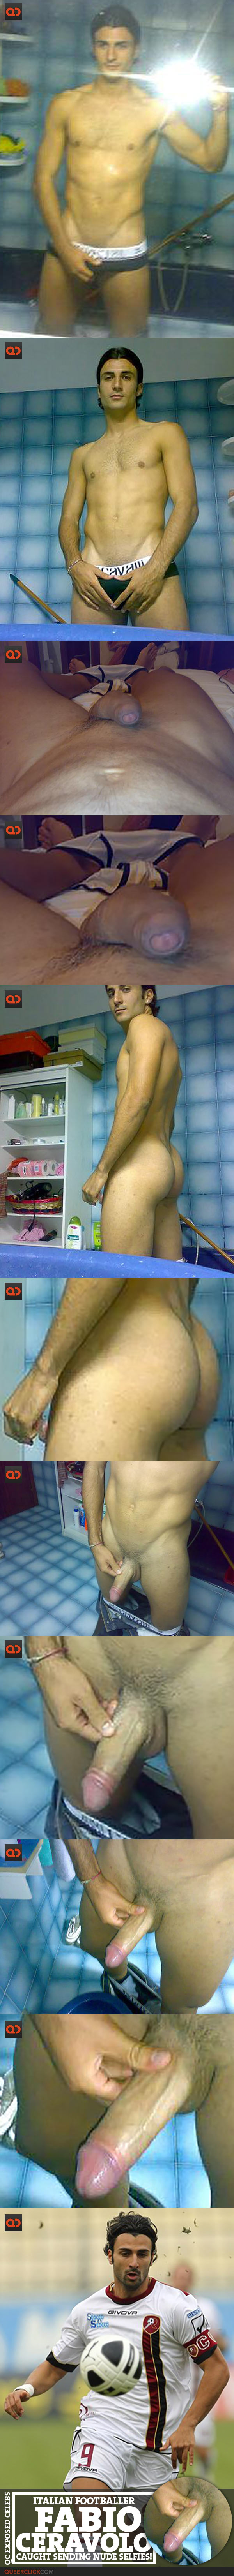 qc-exposed-celebs-fabio-ceravolo_caught_sending_nude_selfies-naked-in-bora_bora-collage03